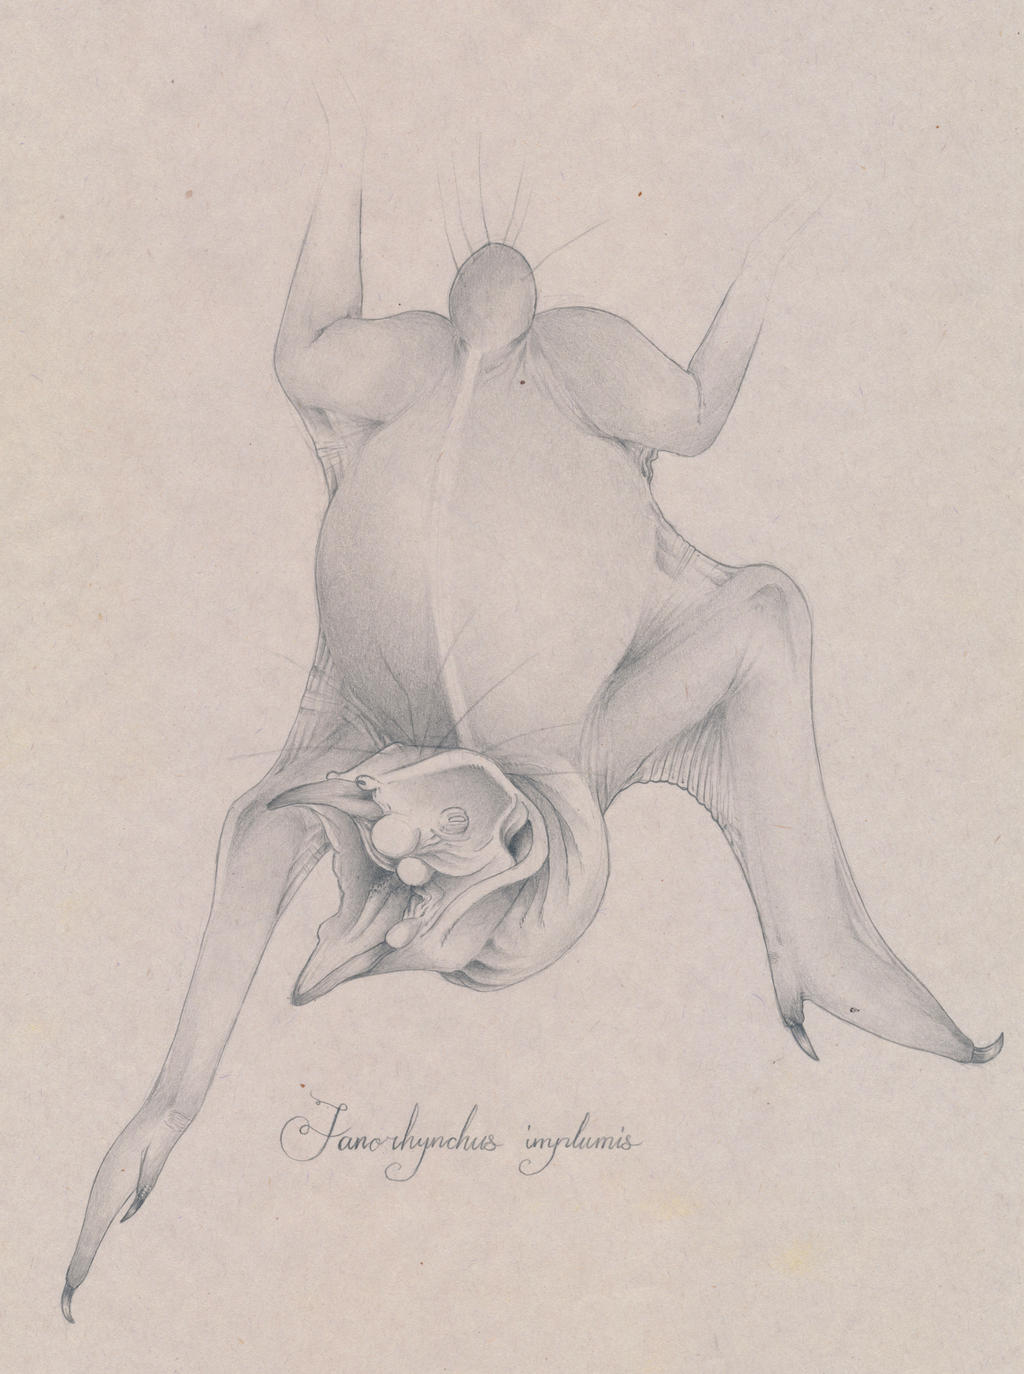 TERRA MIRUS: Fanorhynchus implumis by juniorWoodchuck